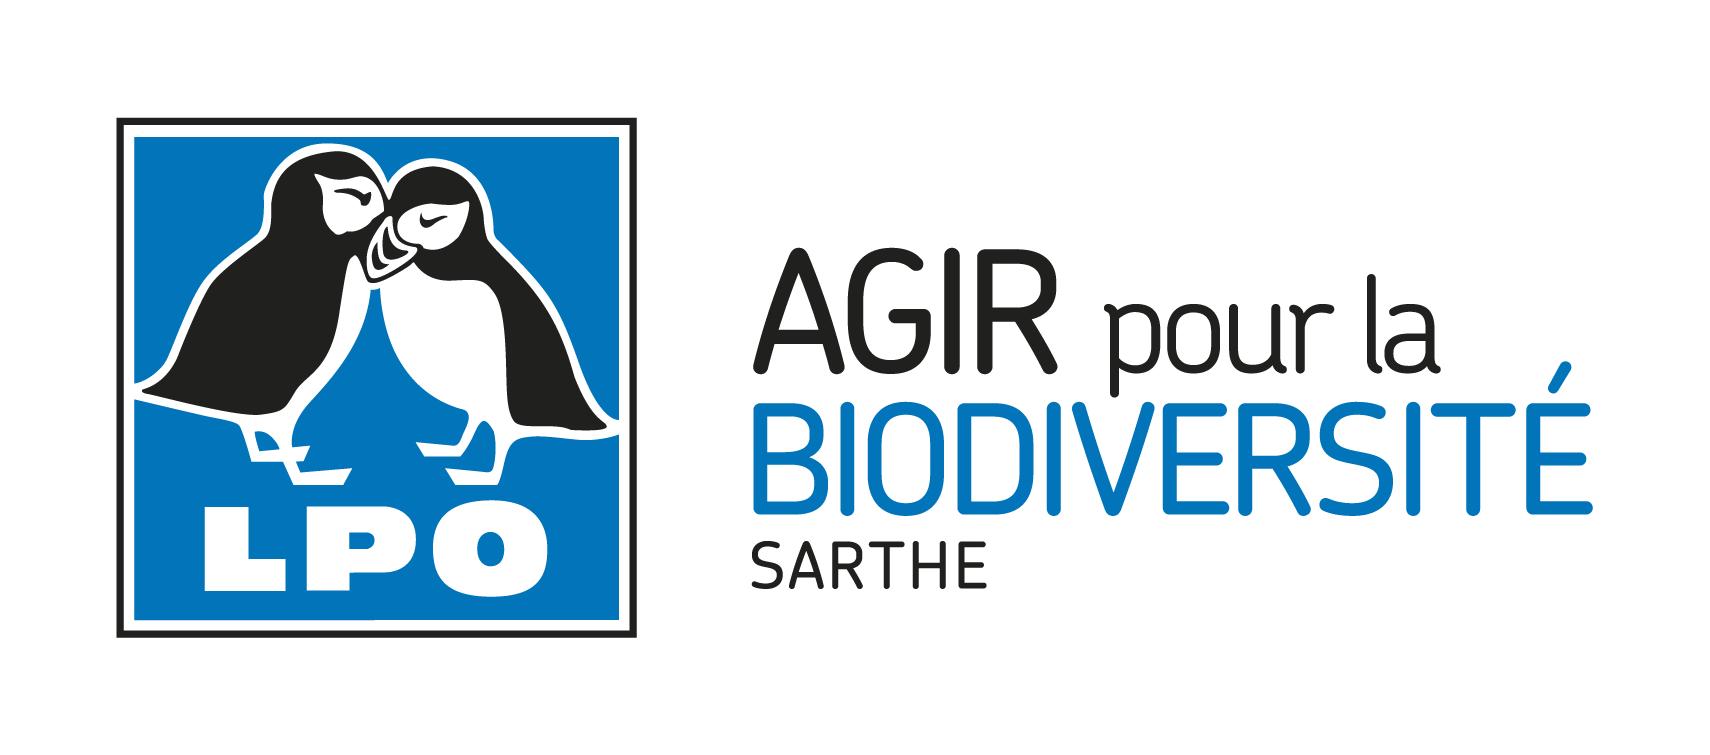 https://cdnfiles2.biolovision.net/www.faune-maine.org/userfiles/LPOAgirpourlabioSarthe.png